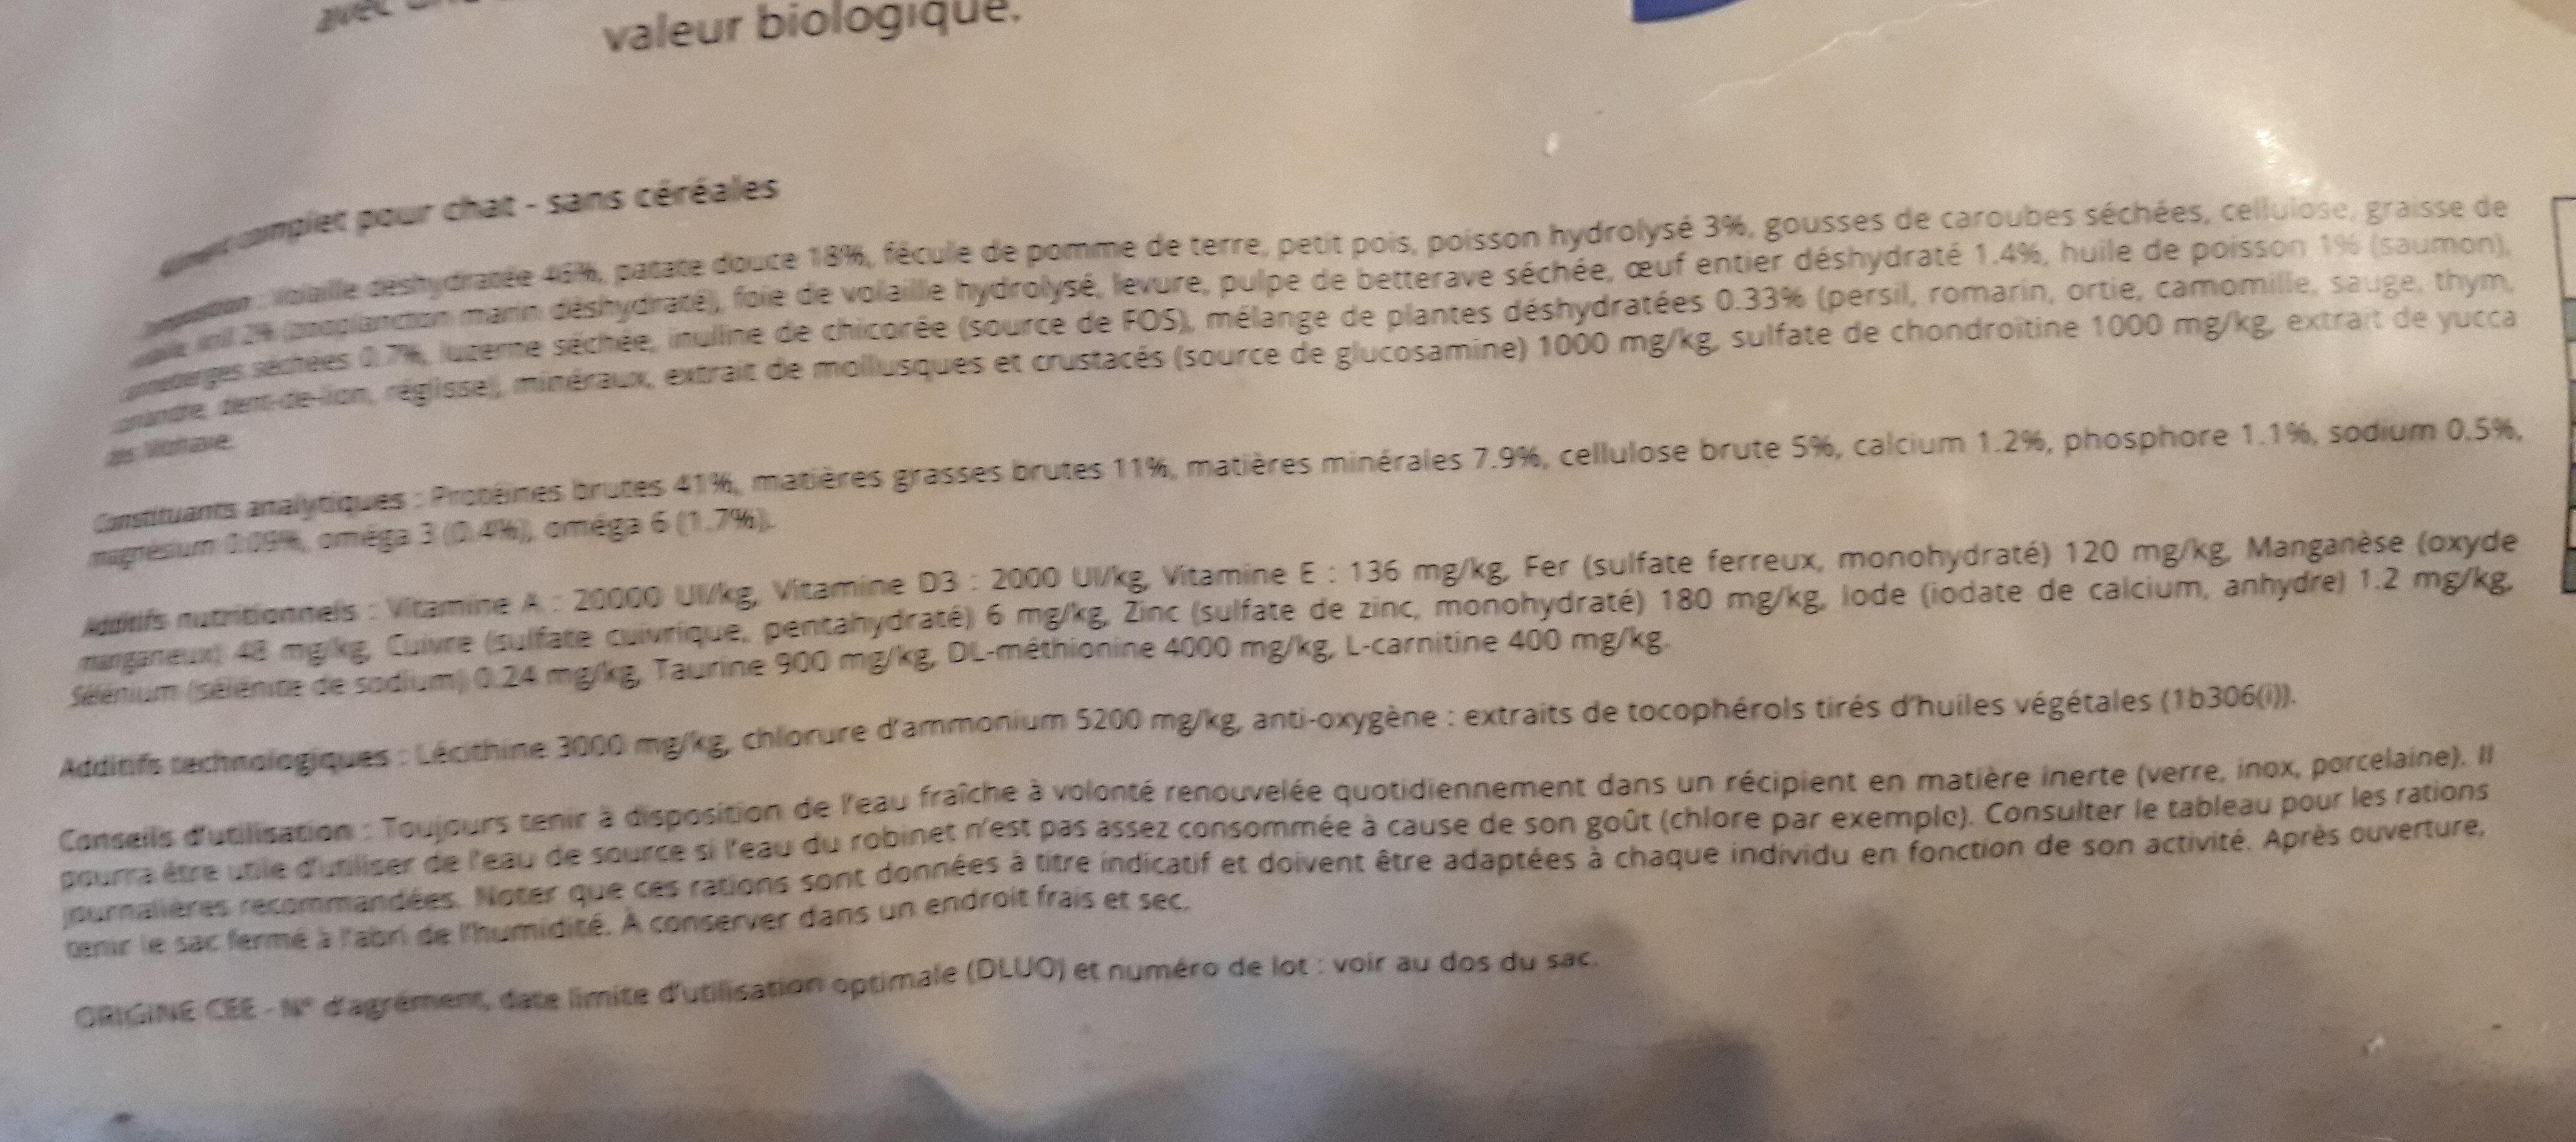 Adult sterilized cat grain free - Ingredients - fr